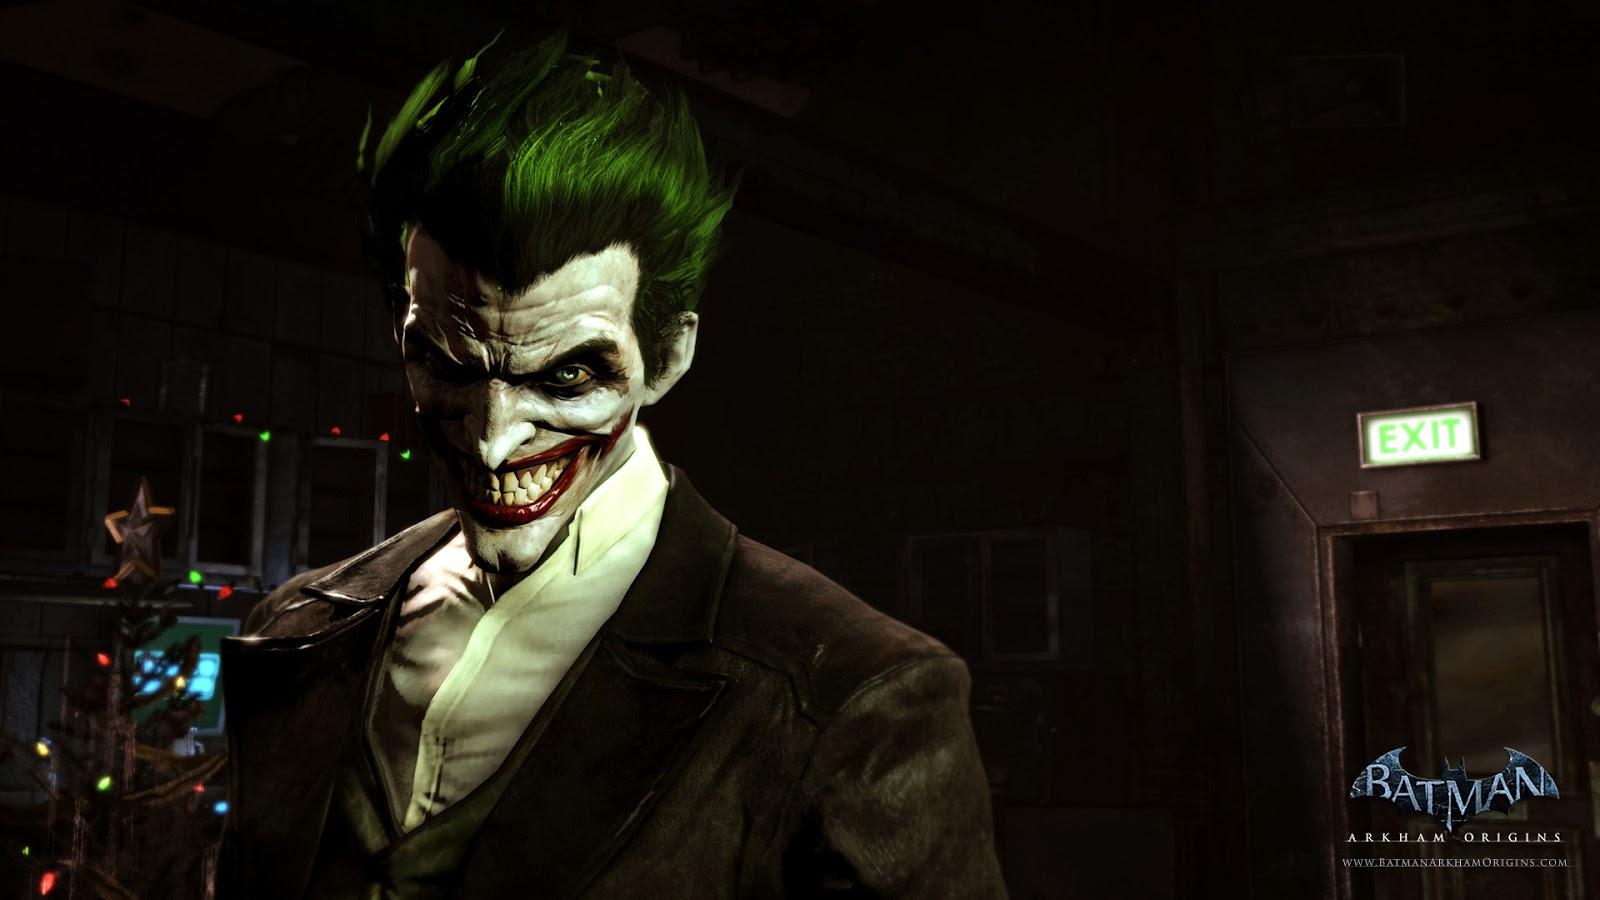 Batman Arkham Origins The Joker Wallpaper HiresMOVIEWALLcom 1600x900